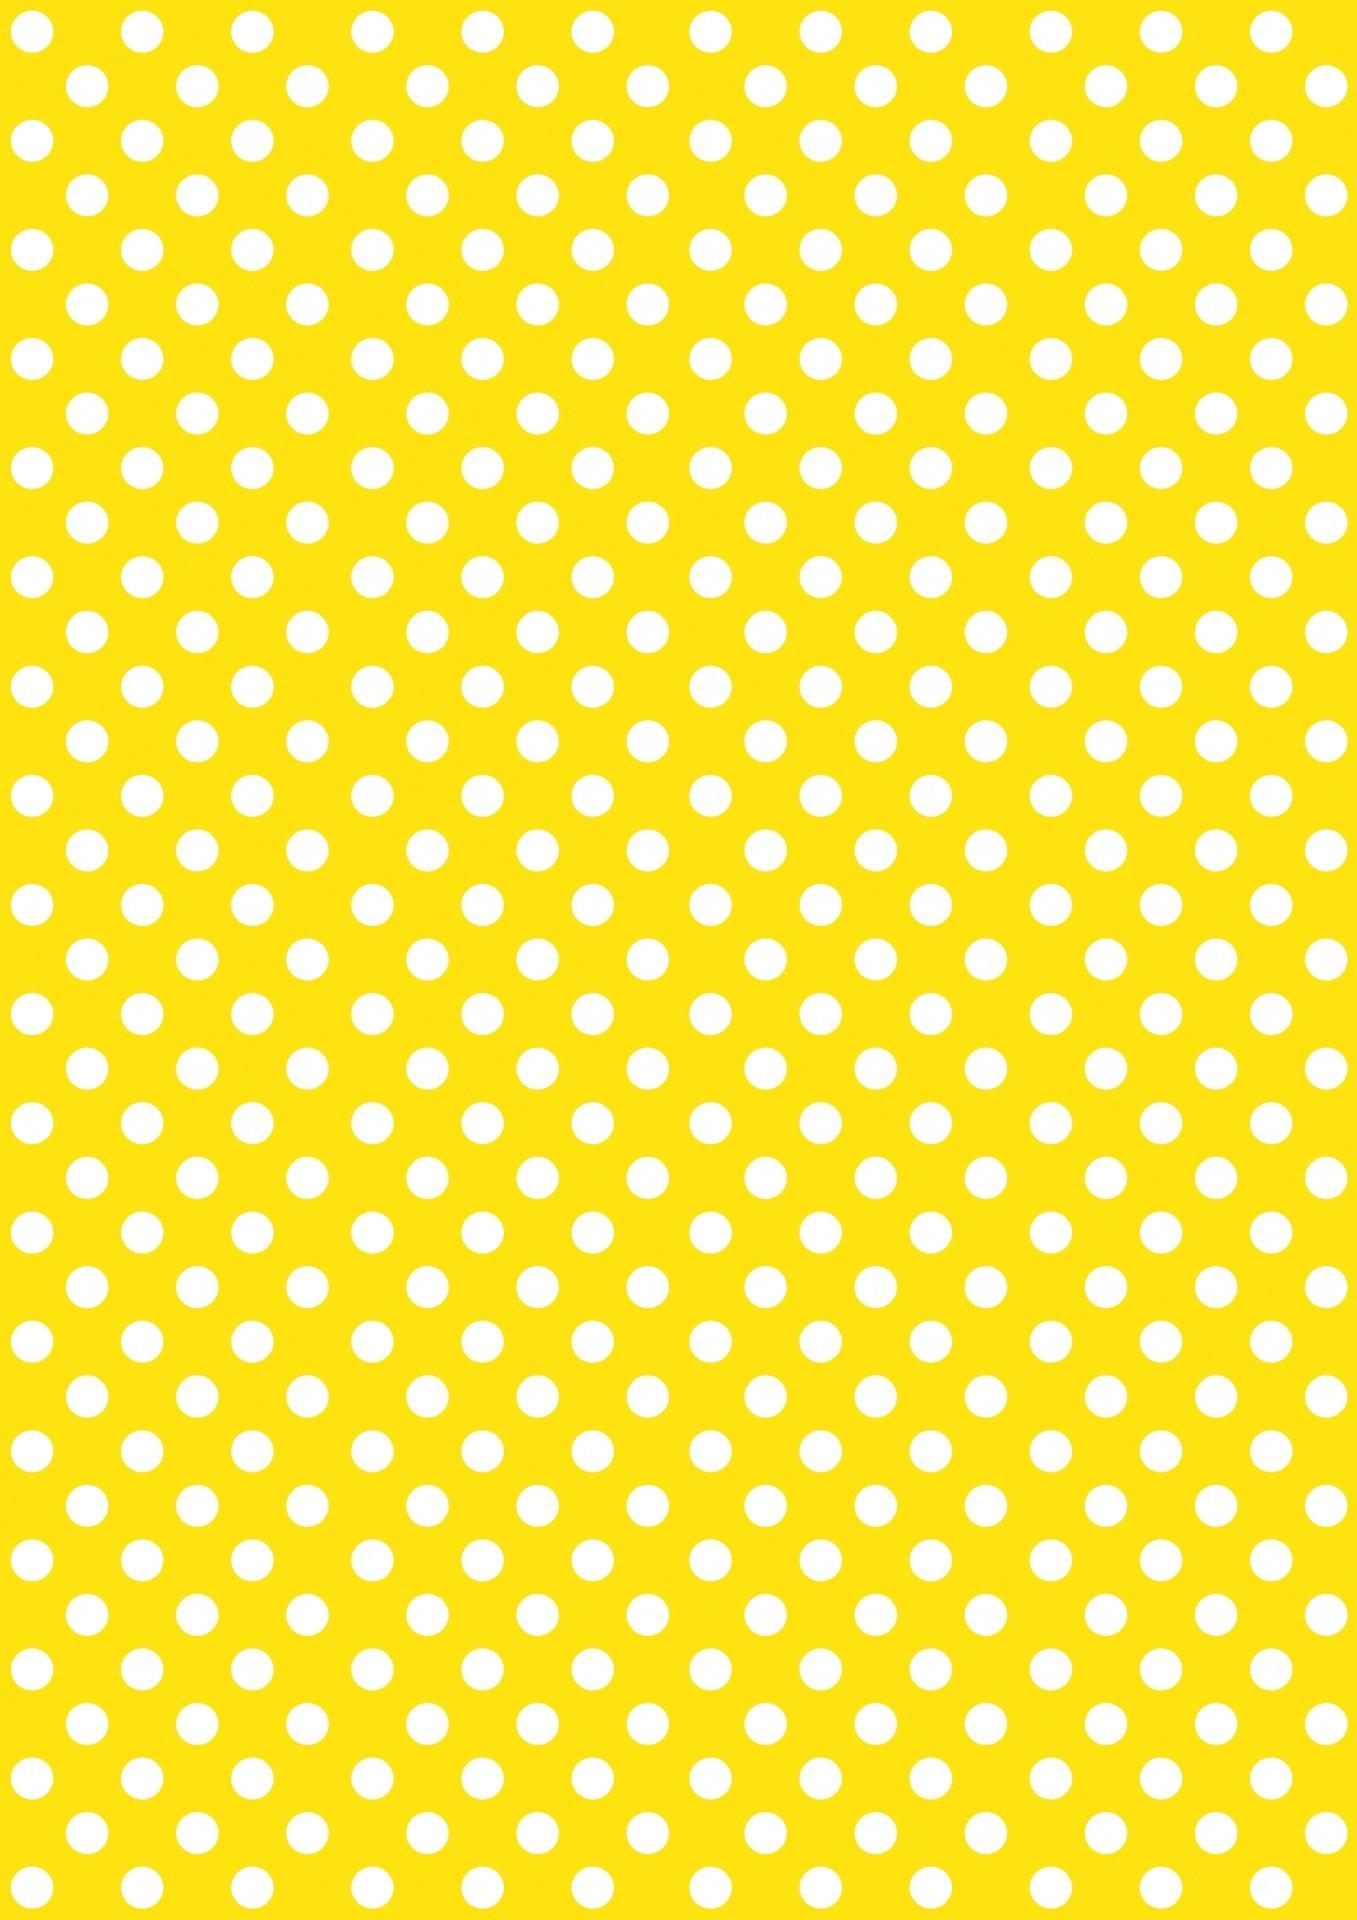 gray pin dot background